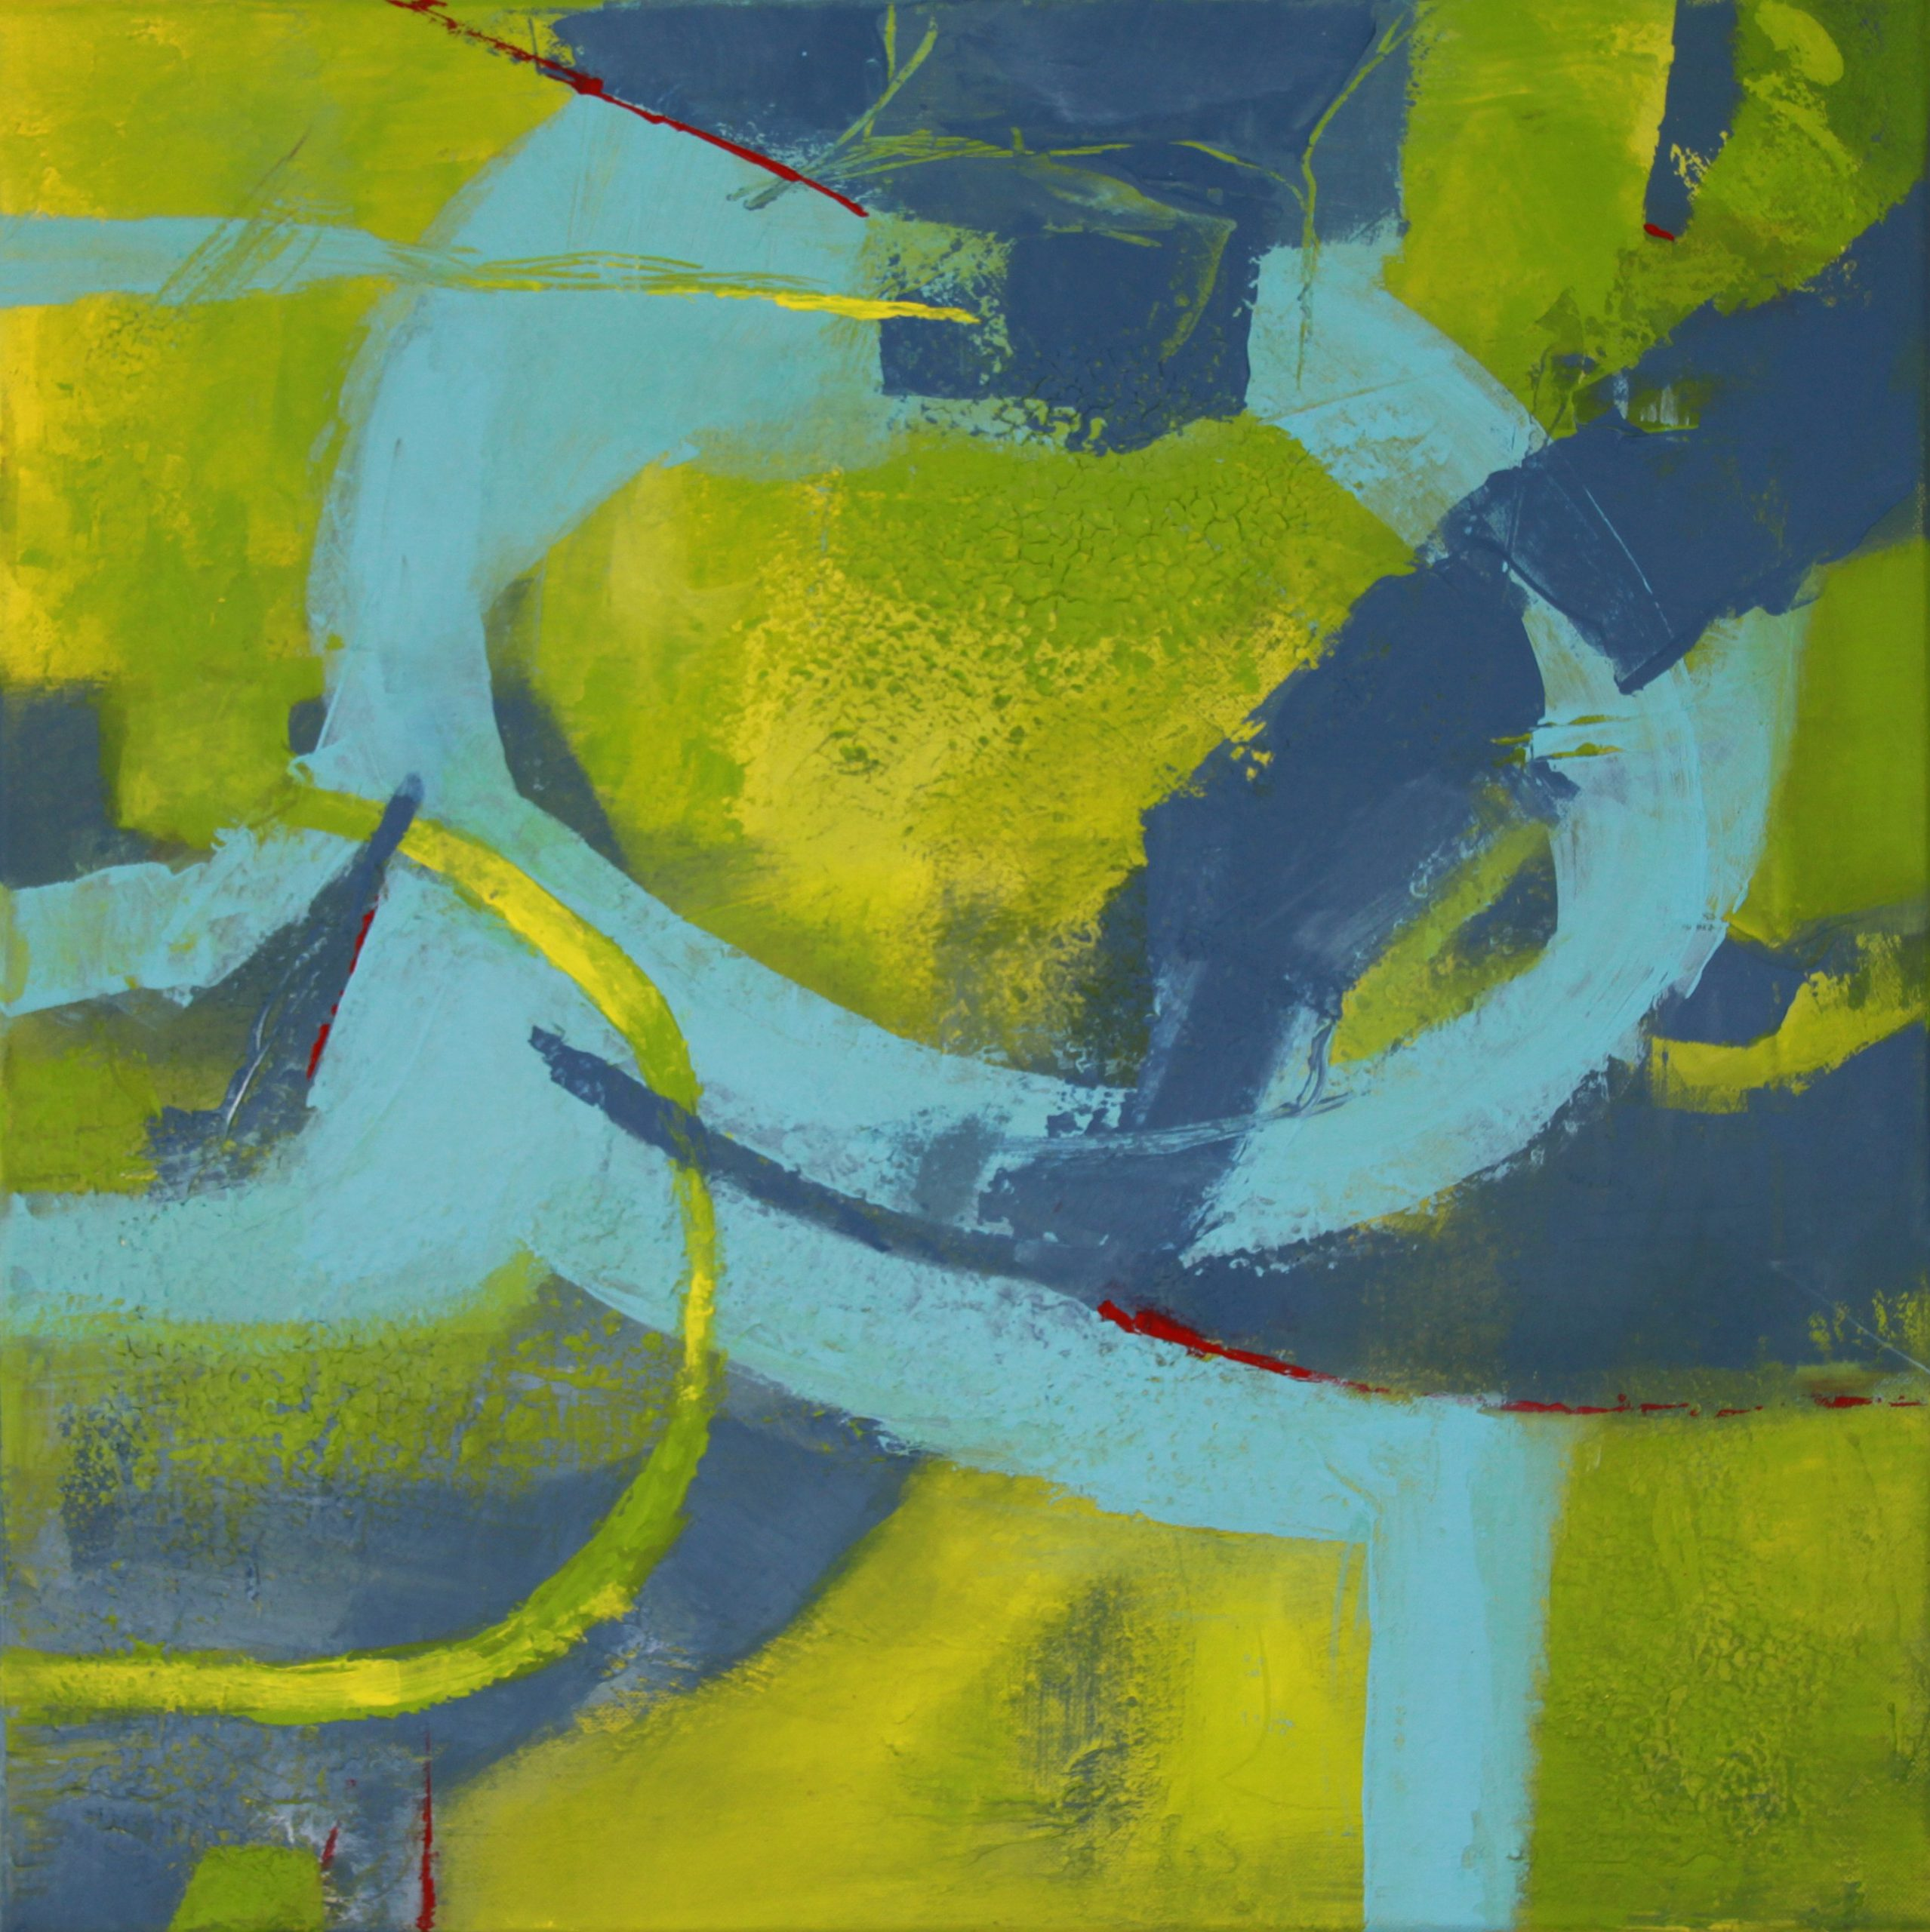 Ramona Merkl: Blickwinkel, Marmormehl mit Acryl, 50 x 50 x 1,5 cm